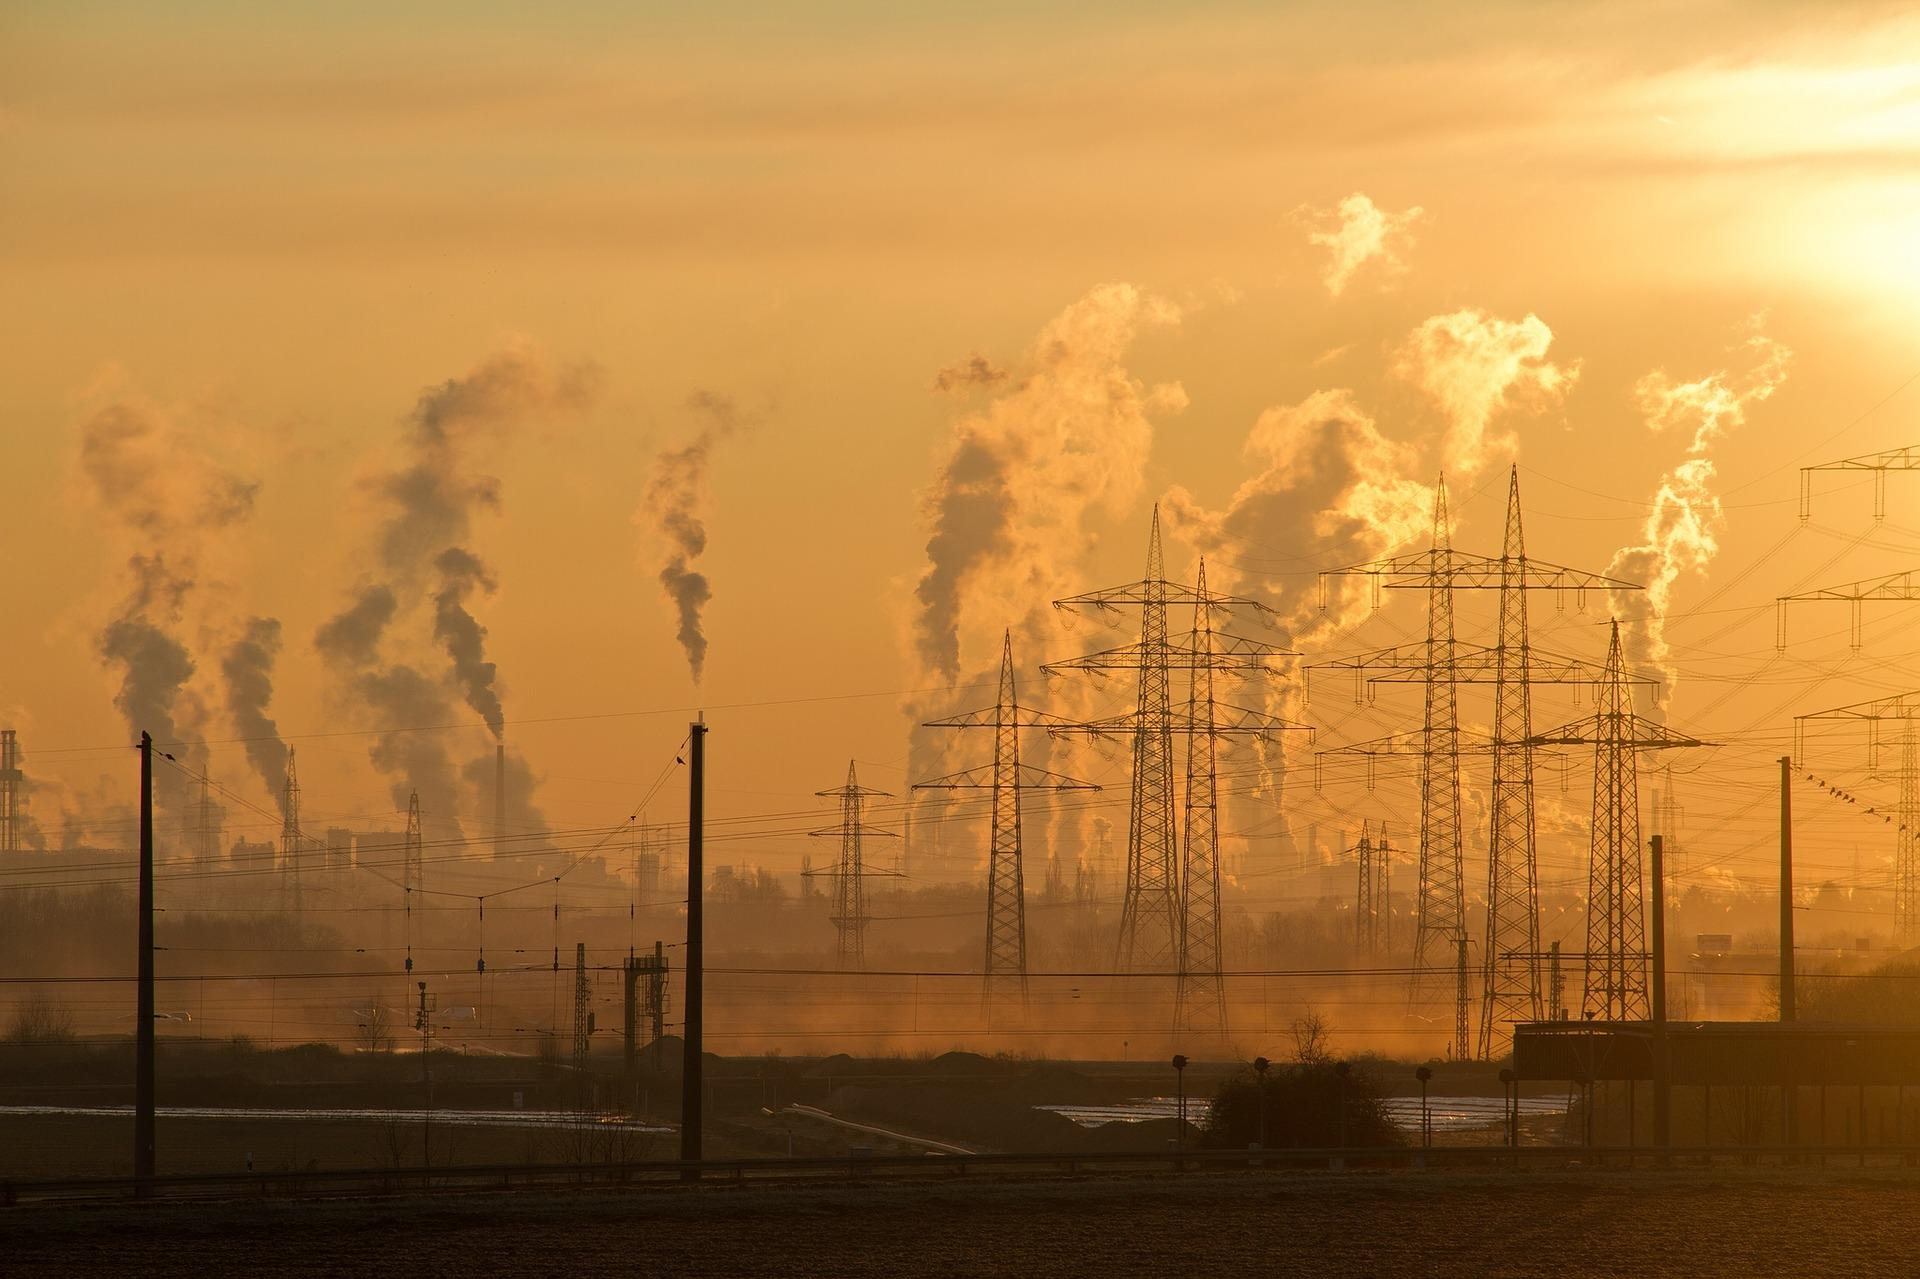 "<span class=""caps"">CCS</span> — Carbon Dioxide Capture and Storage"